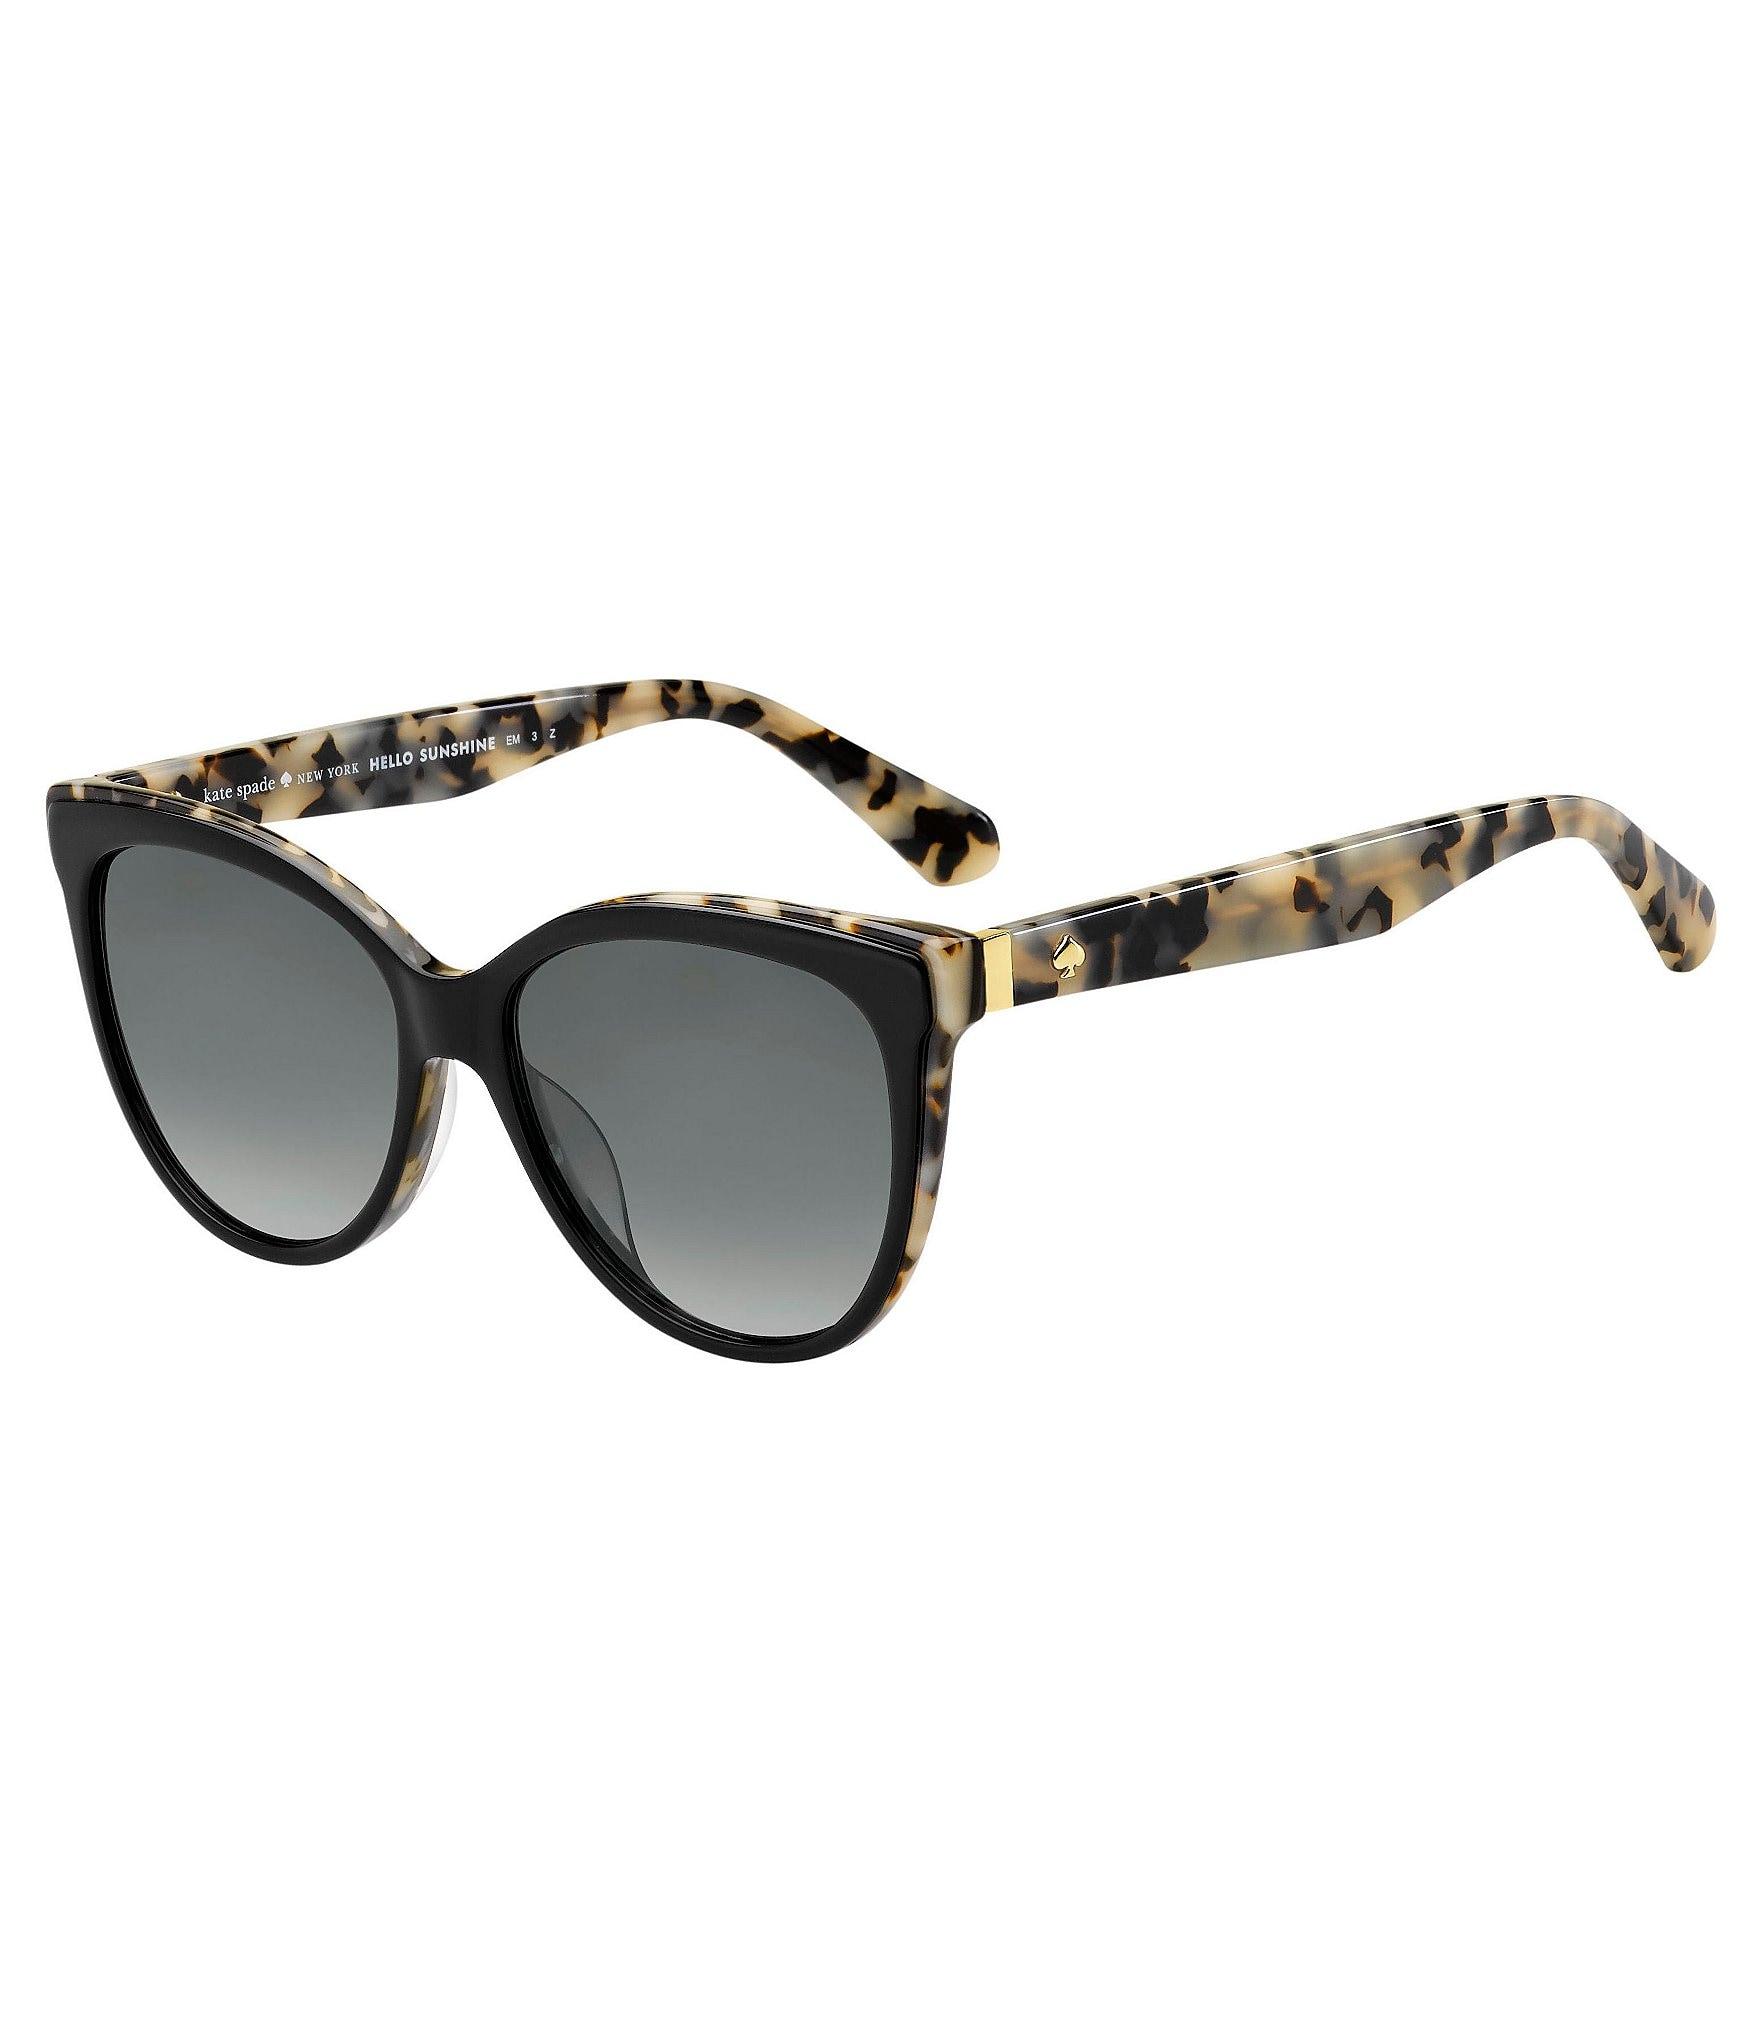 ce30c78ba5c8 White Women's Cat-Eye Sunglasses | Dillards